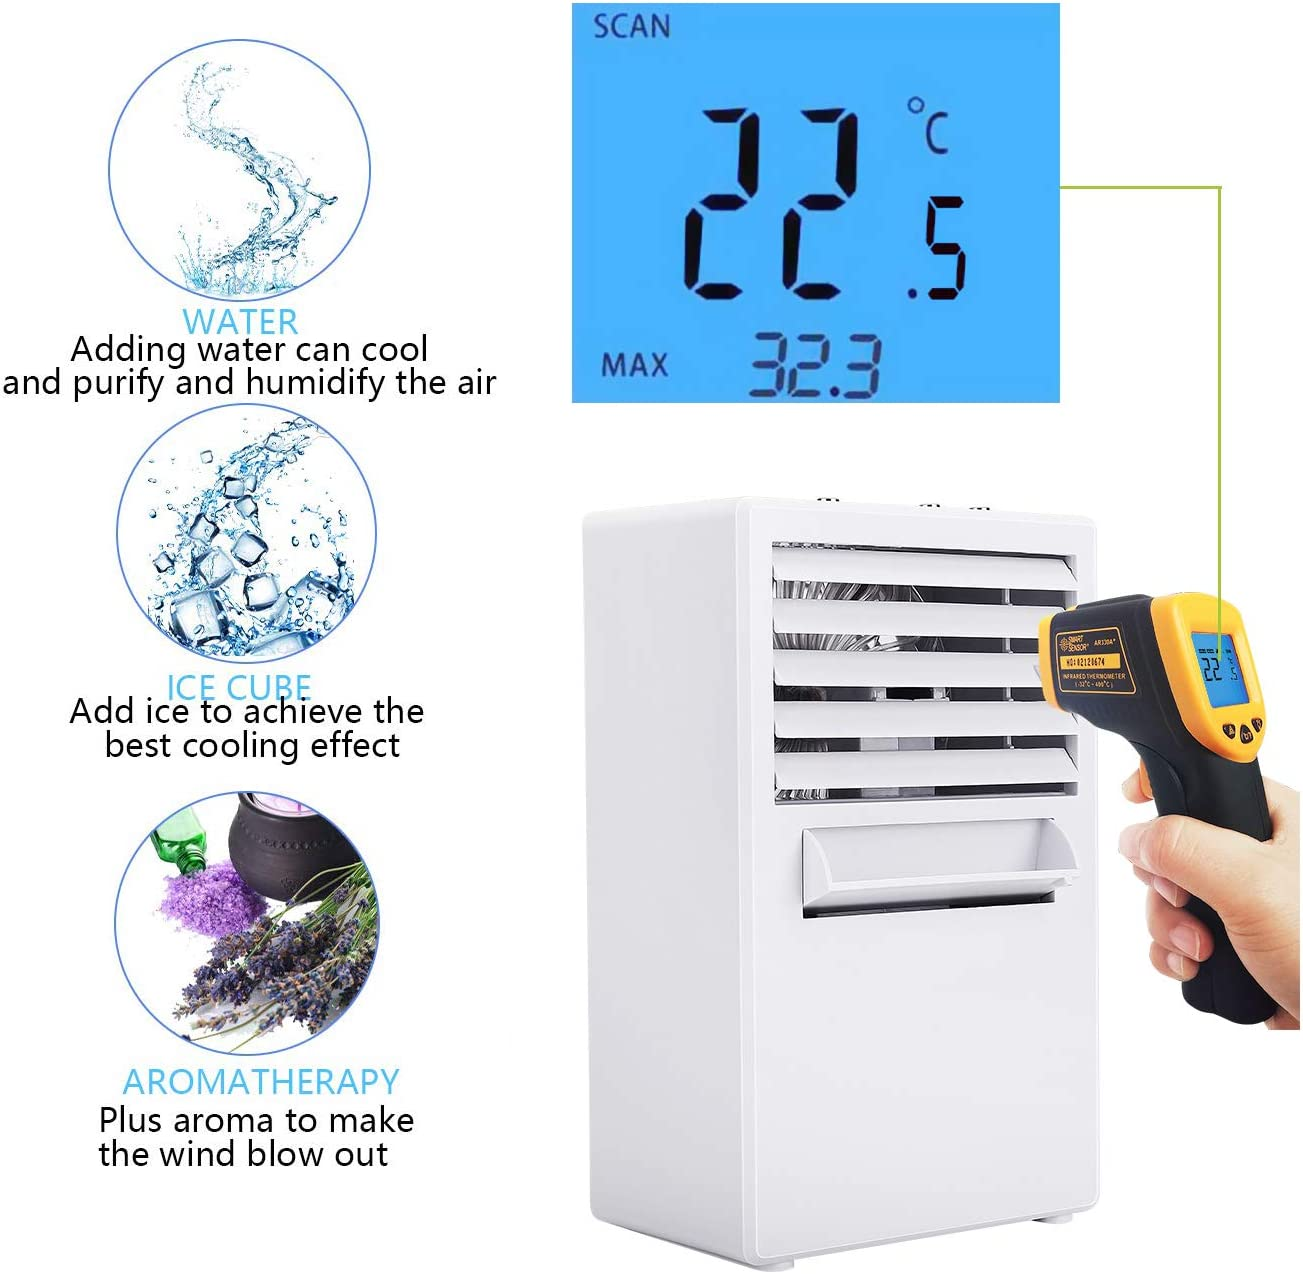 Climatizador Evaporativo Port/átil para Casa y Oficina 3 En 1 Espacio Personal Enfriador de Aire Humidificador Purificador 3 Velocidades Winload Mini Climatizador Aire Acondicionado M/óvil